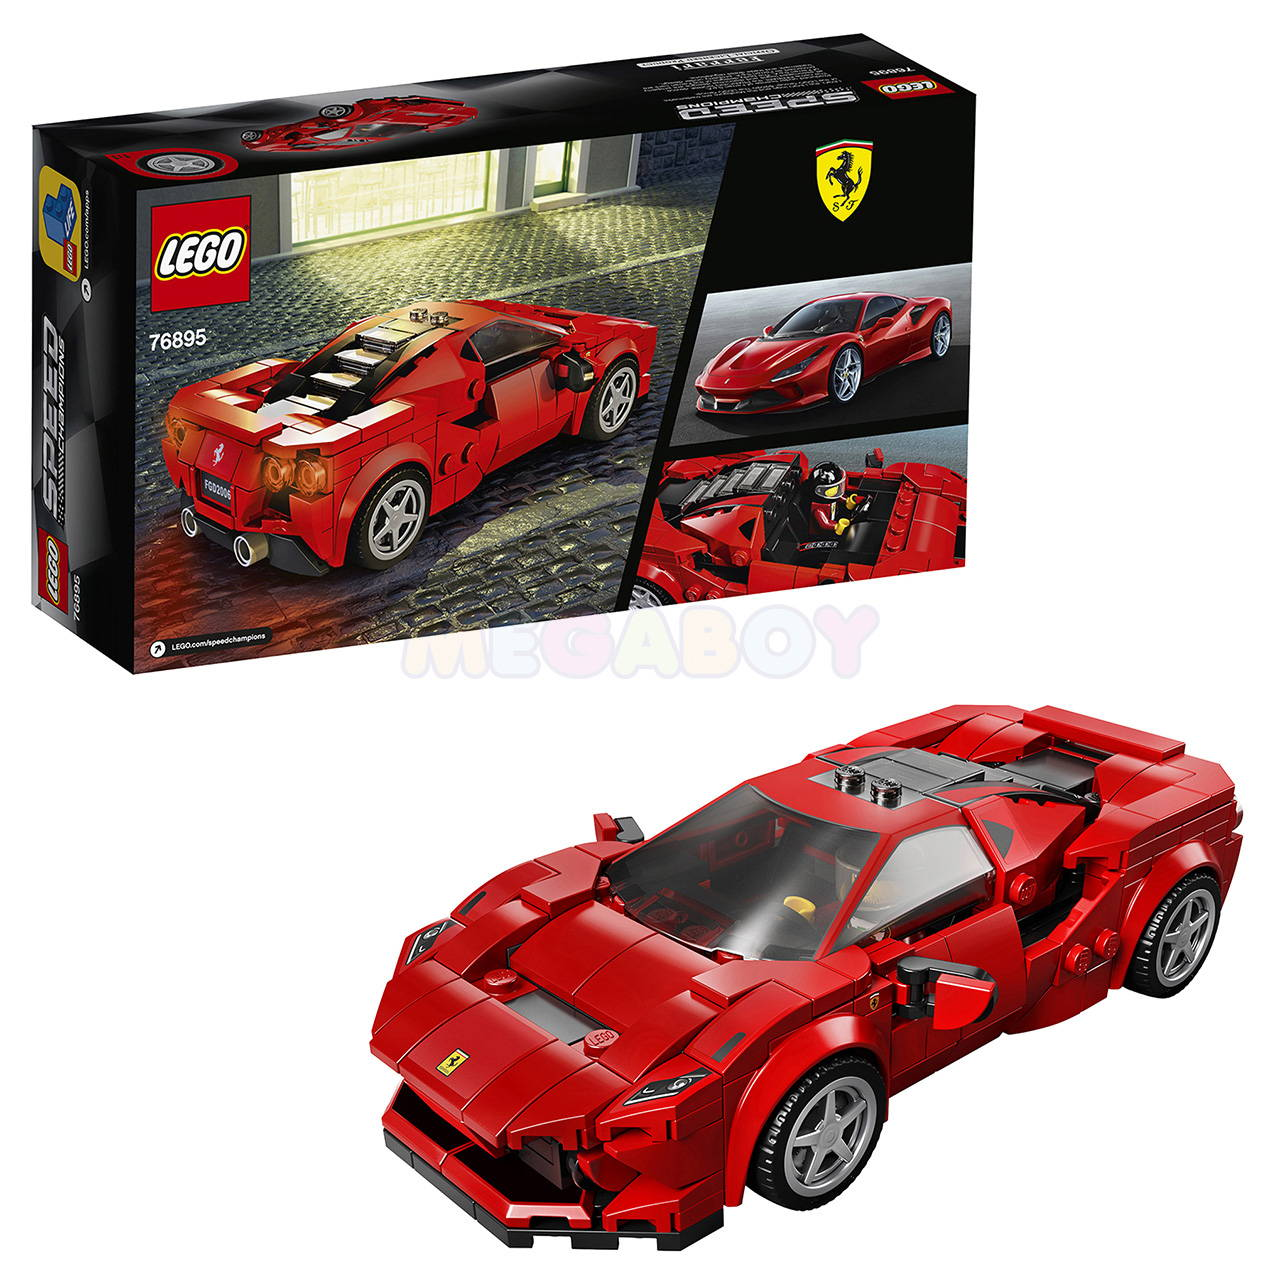 LEGO 76895: Ferrari F8 Tributo